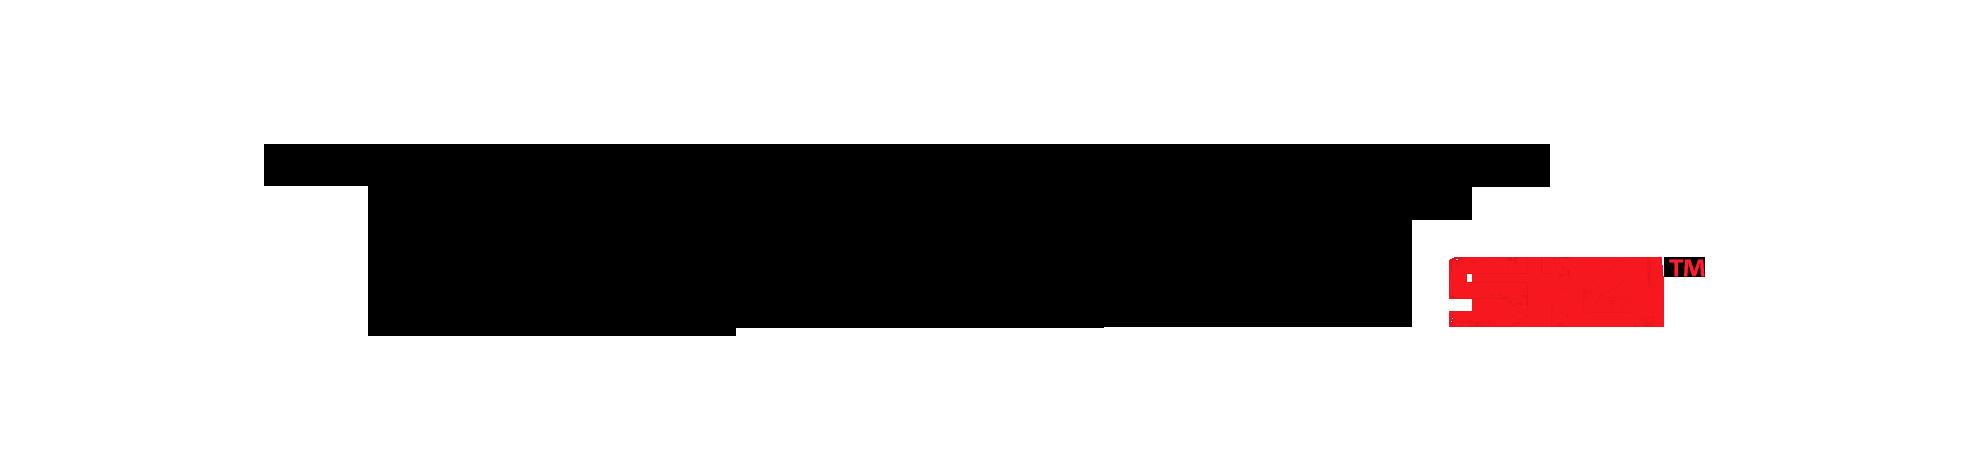 ccp.dust514.logo_.black_.png